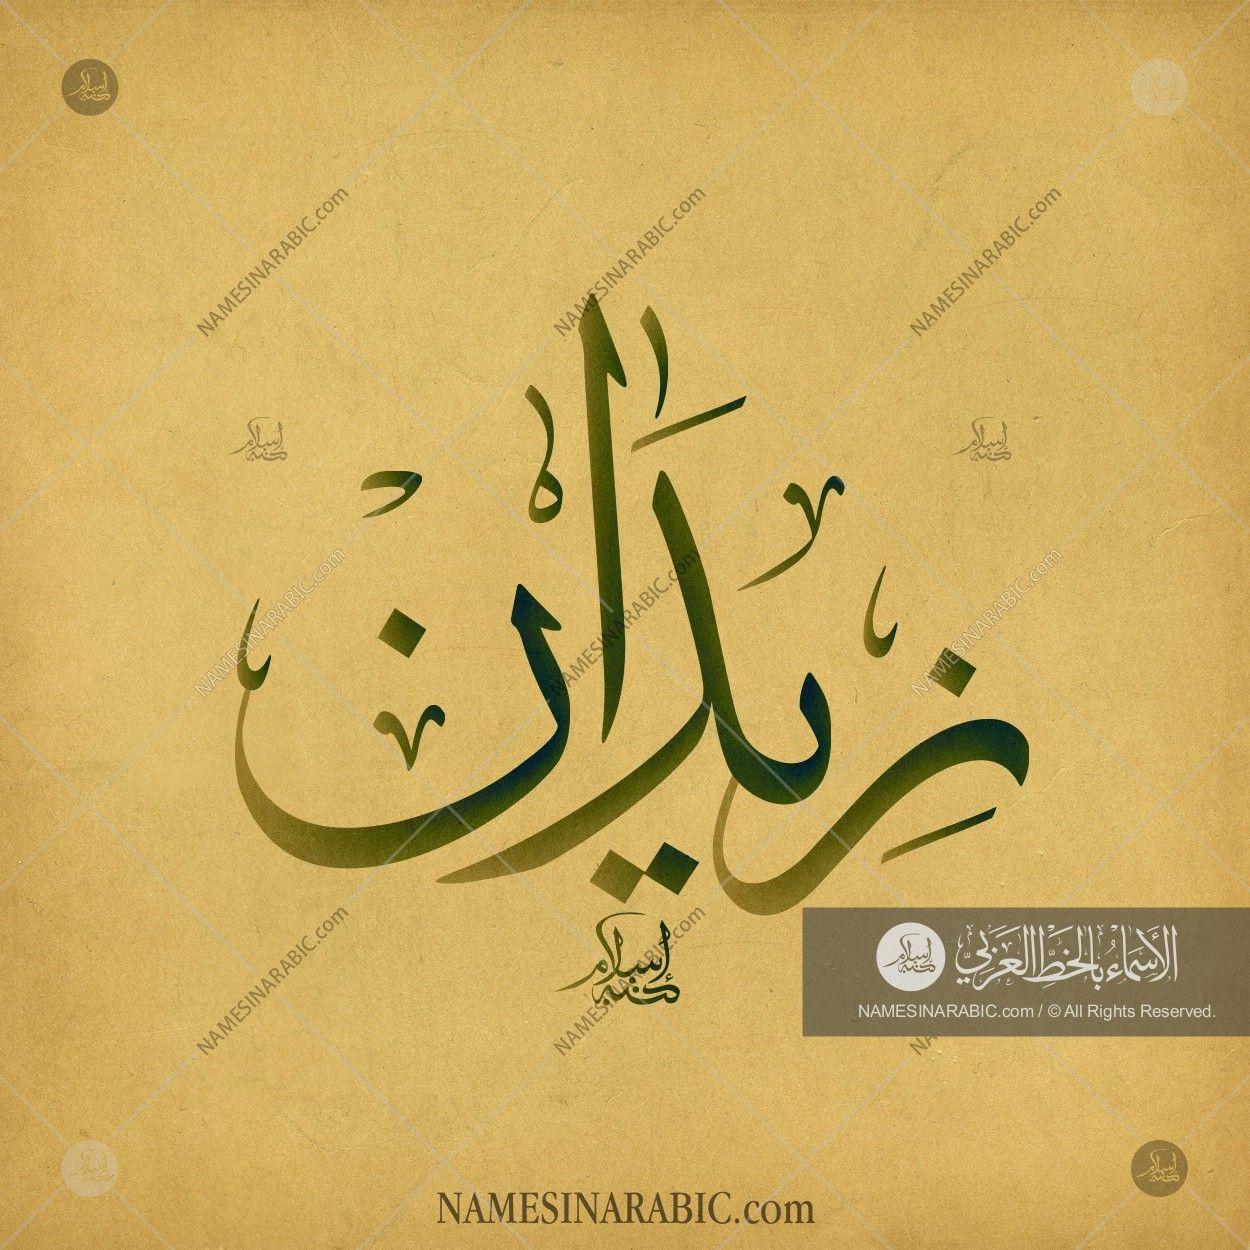 Zidan زيدان Names In Arabic Calligraphy Name 3981 Calligraphy Name Calligraphy Arabic